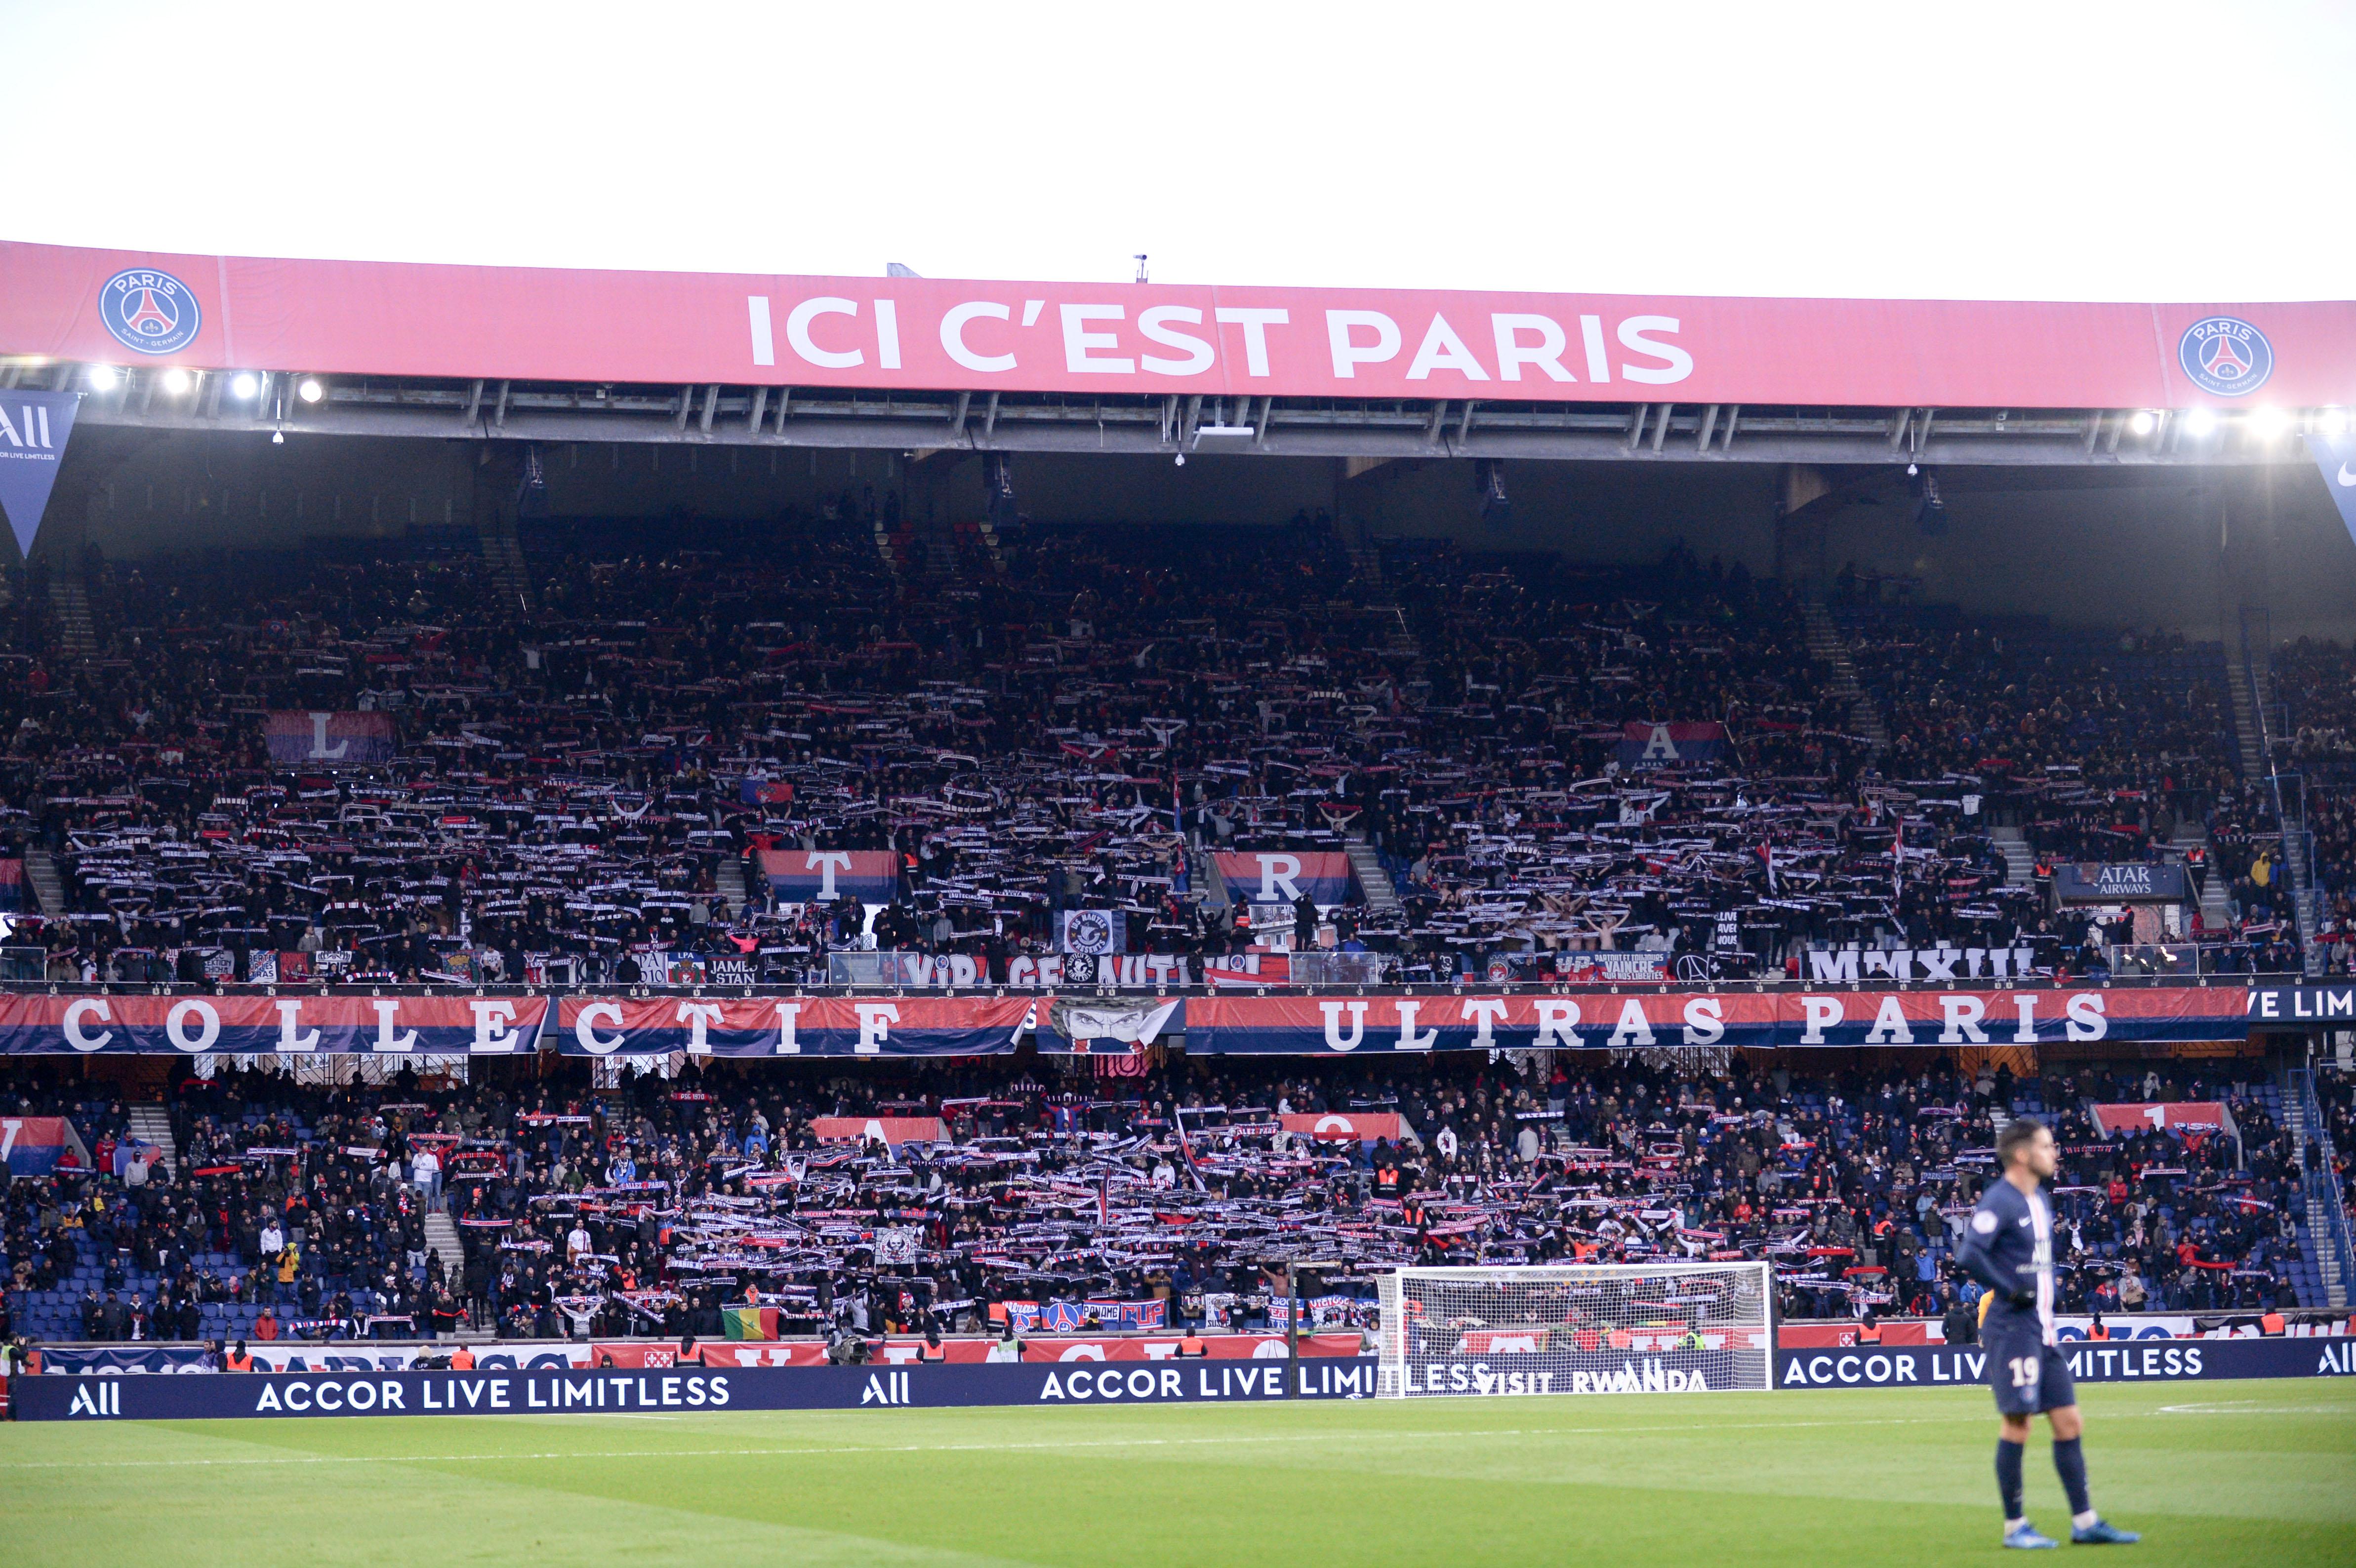 Football - Ligue des champions - Coronavirus: PSG-Dortmund à huis-clos, France-Irlande reporté